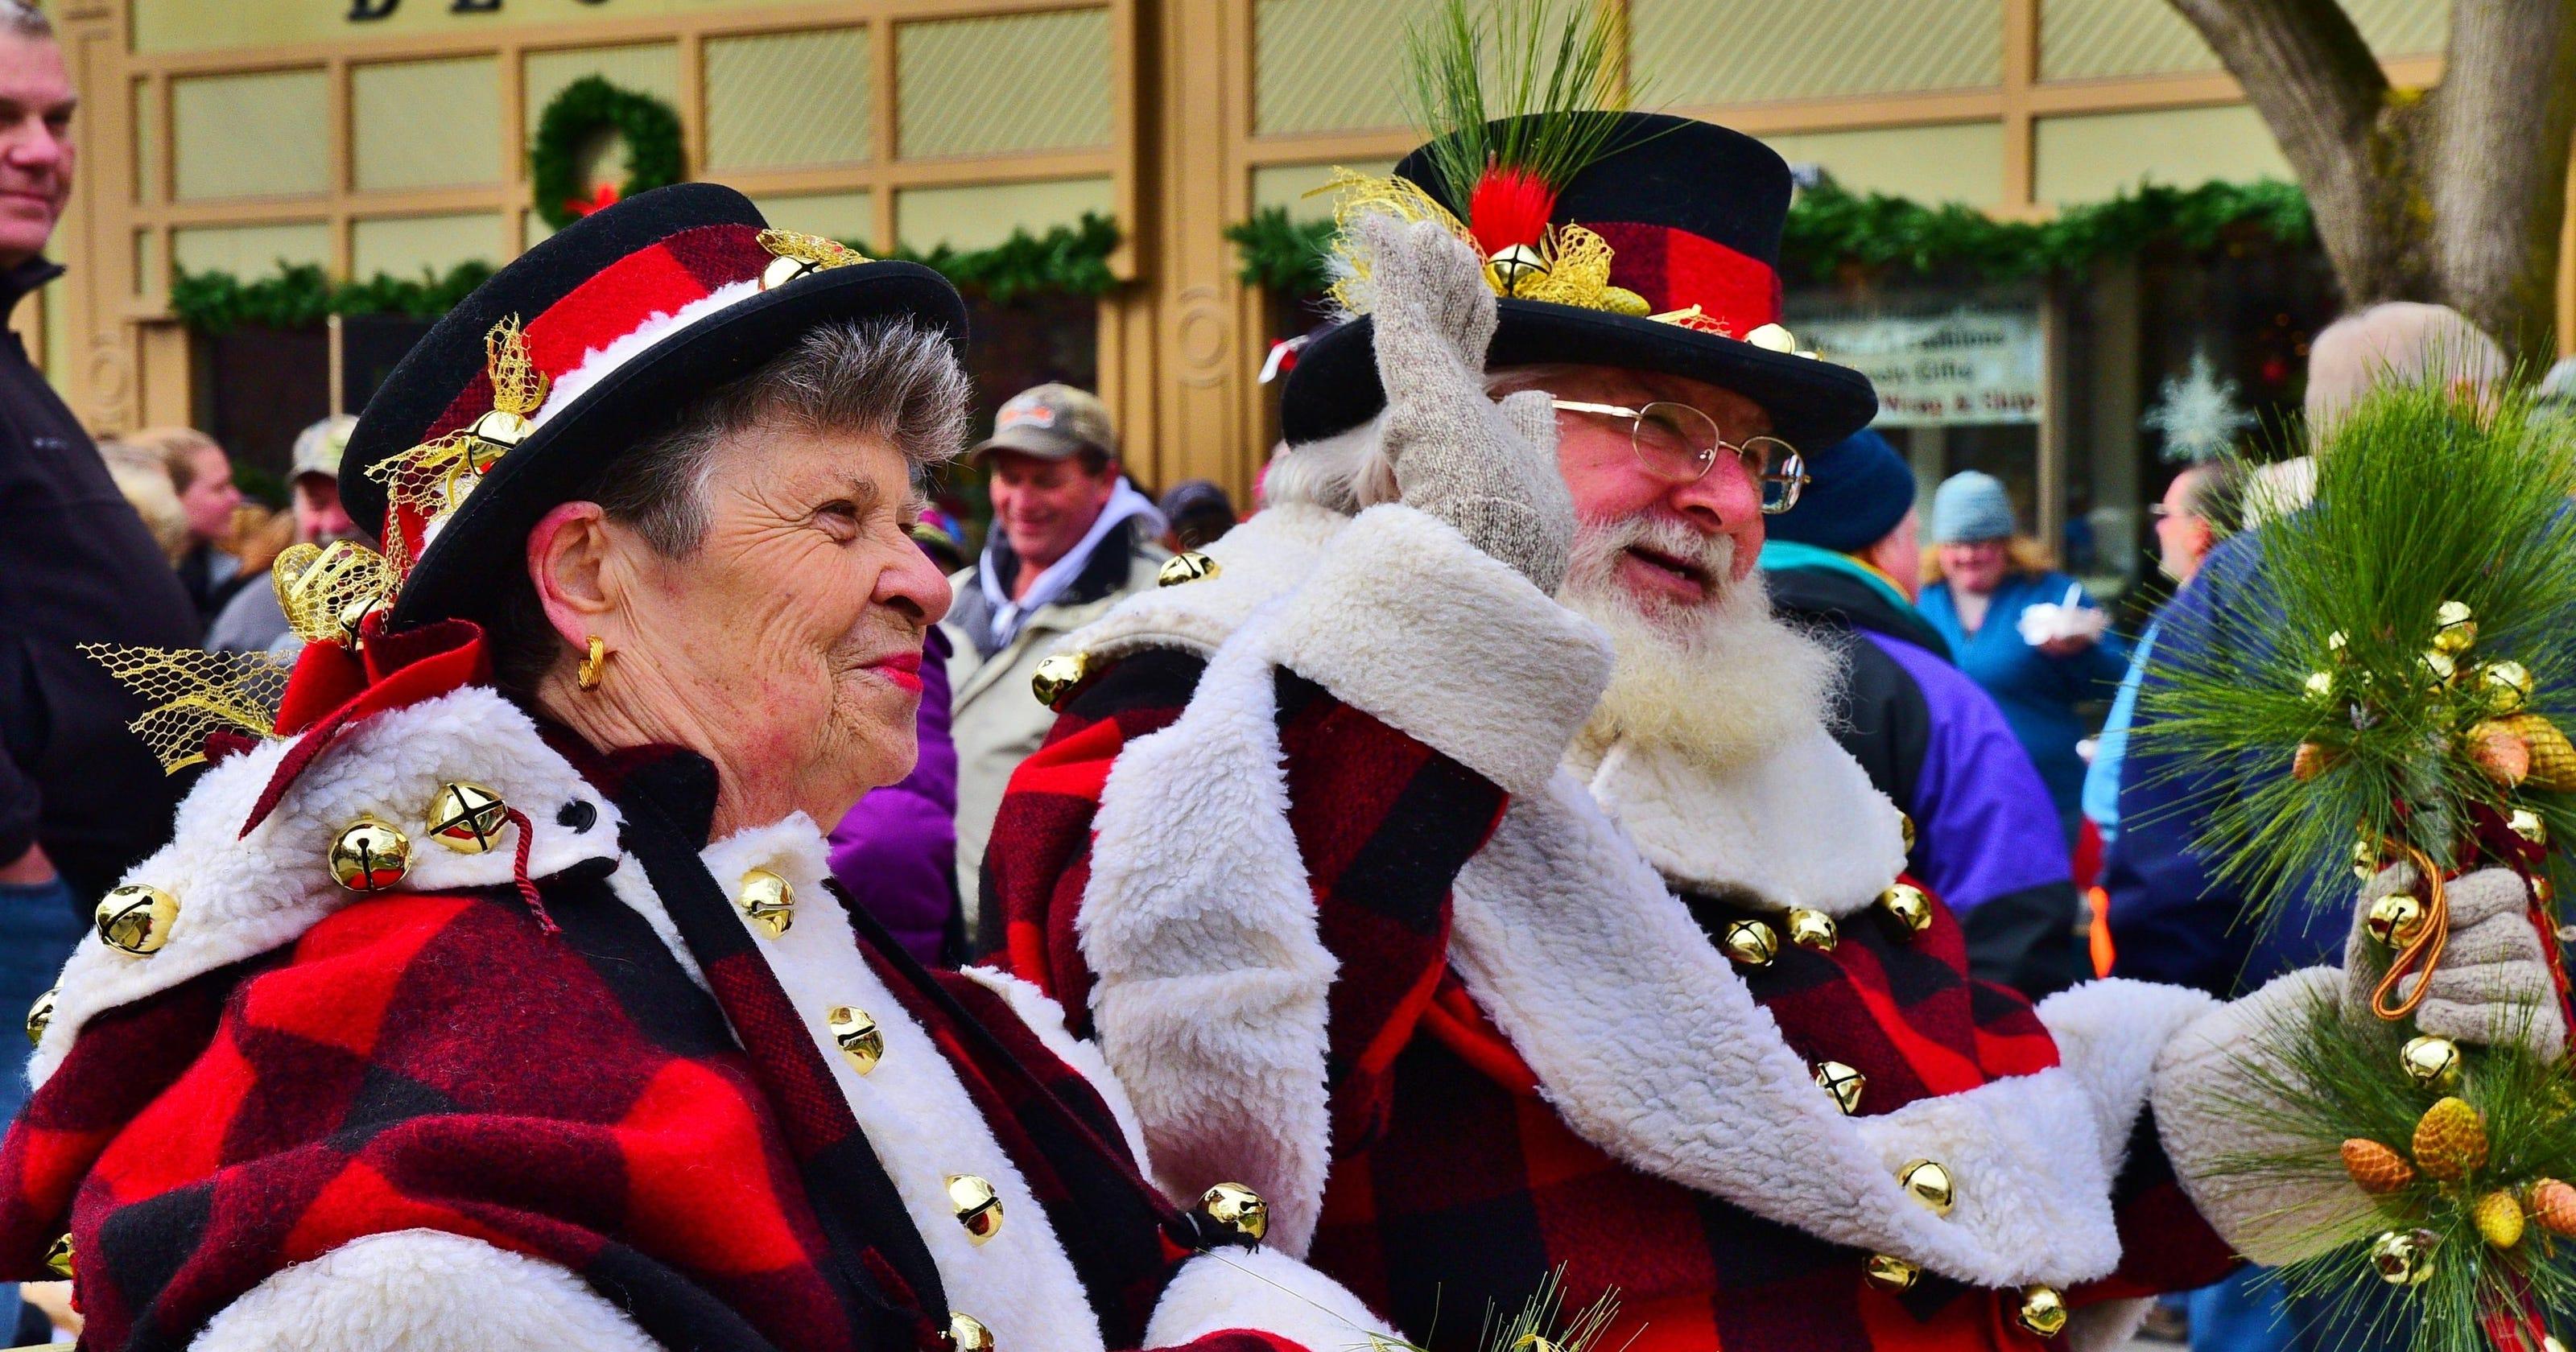 wellsboro invokes victorian era at dickens of a christmas